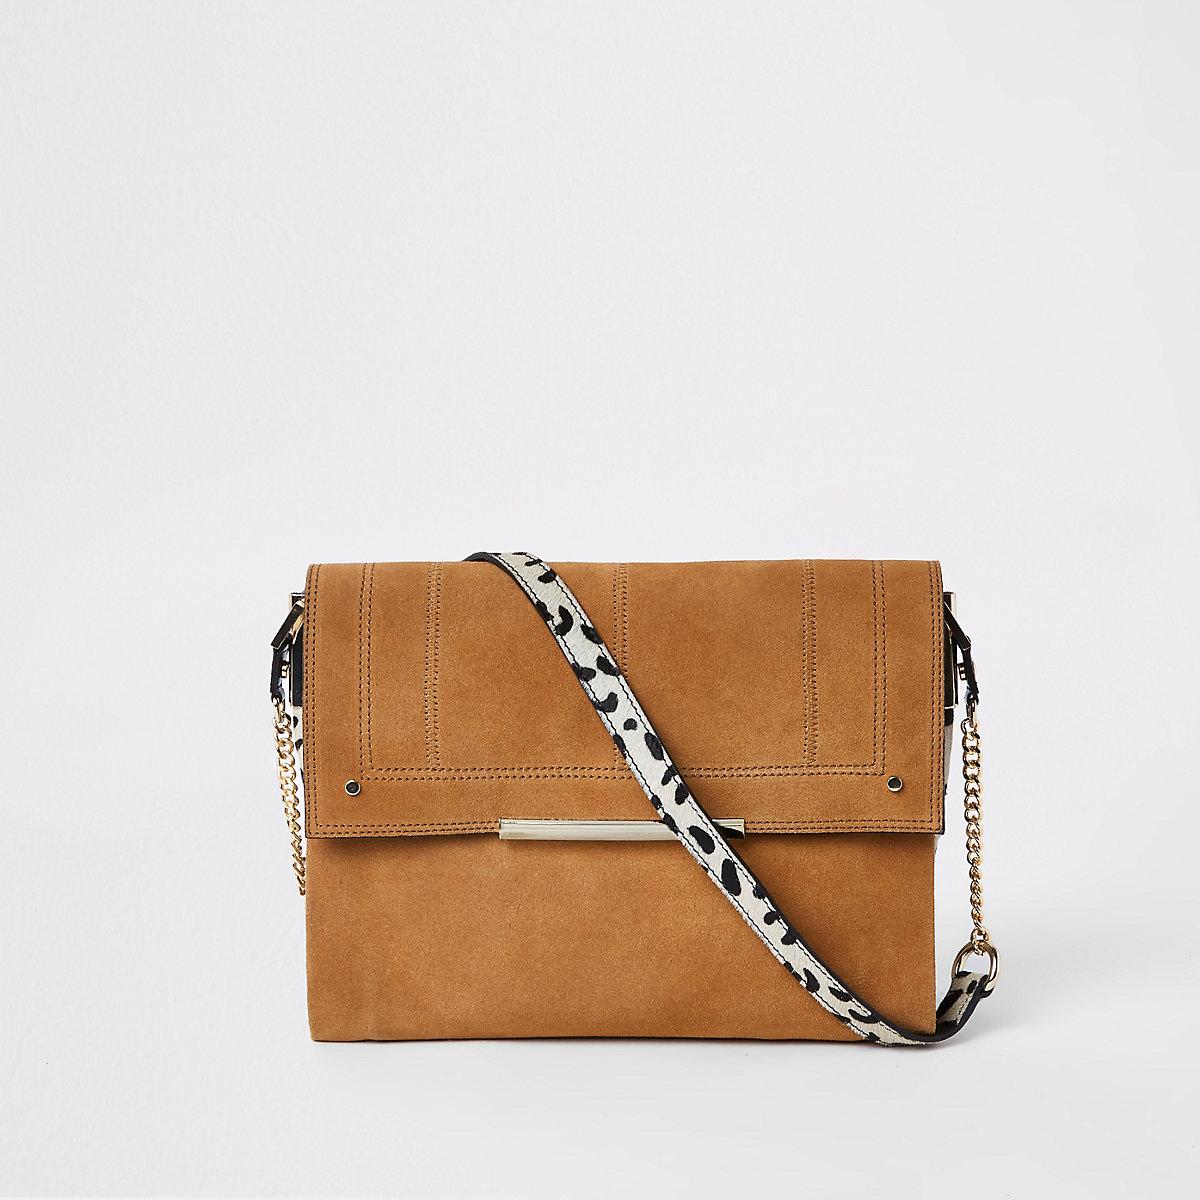 Beige suede leather under arm bag